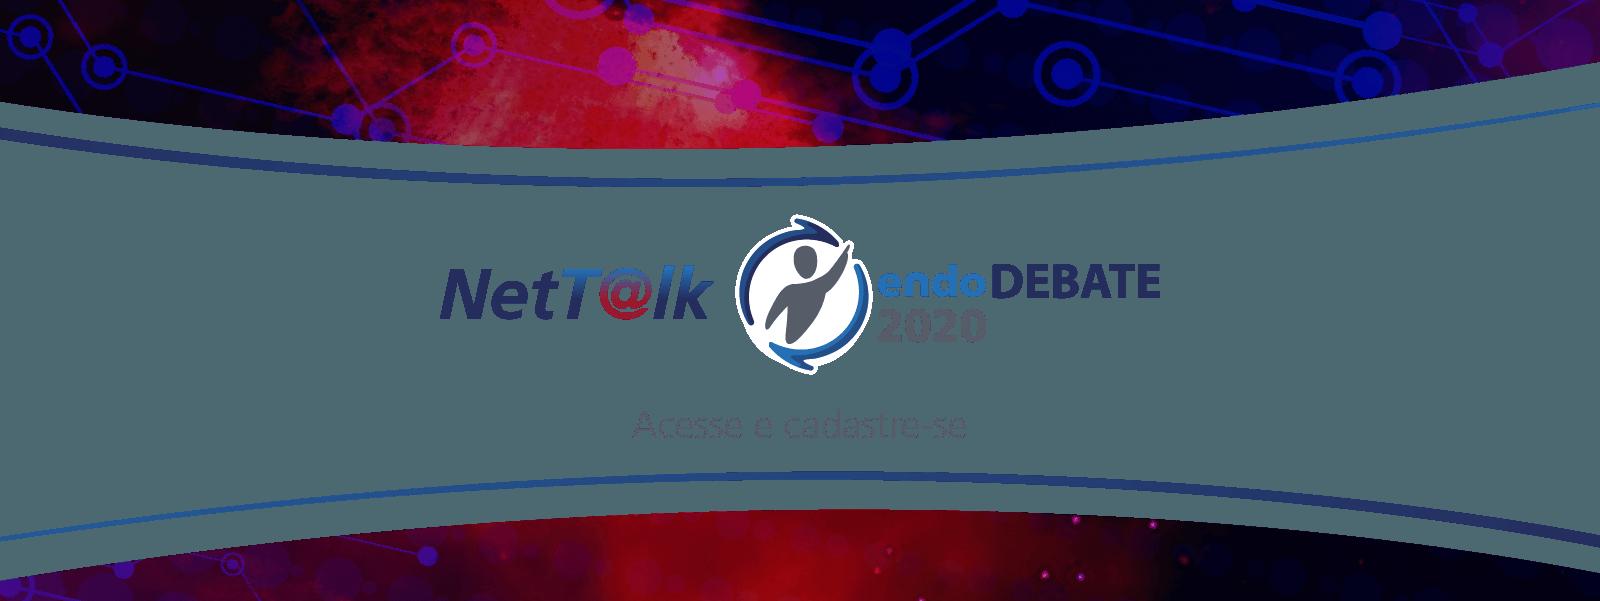 banner-NetTalk-EndoDebate-8